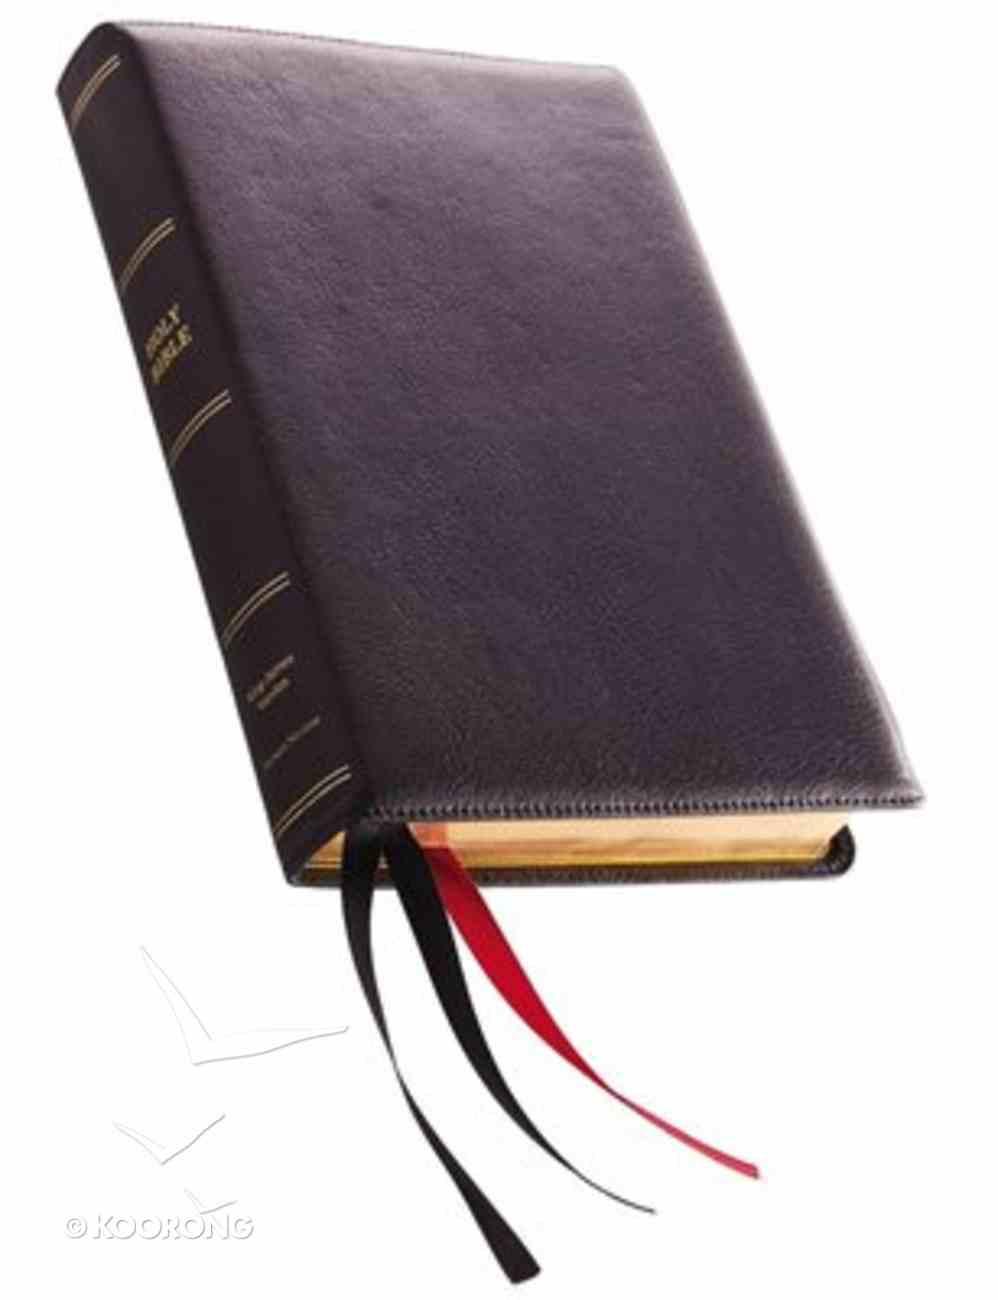 KJV Thinline Bible Giant Print Black Premier Collection (Black Letter Edition) Genuine Leather